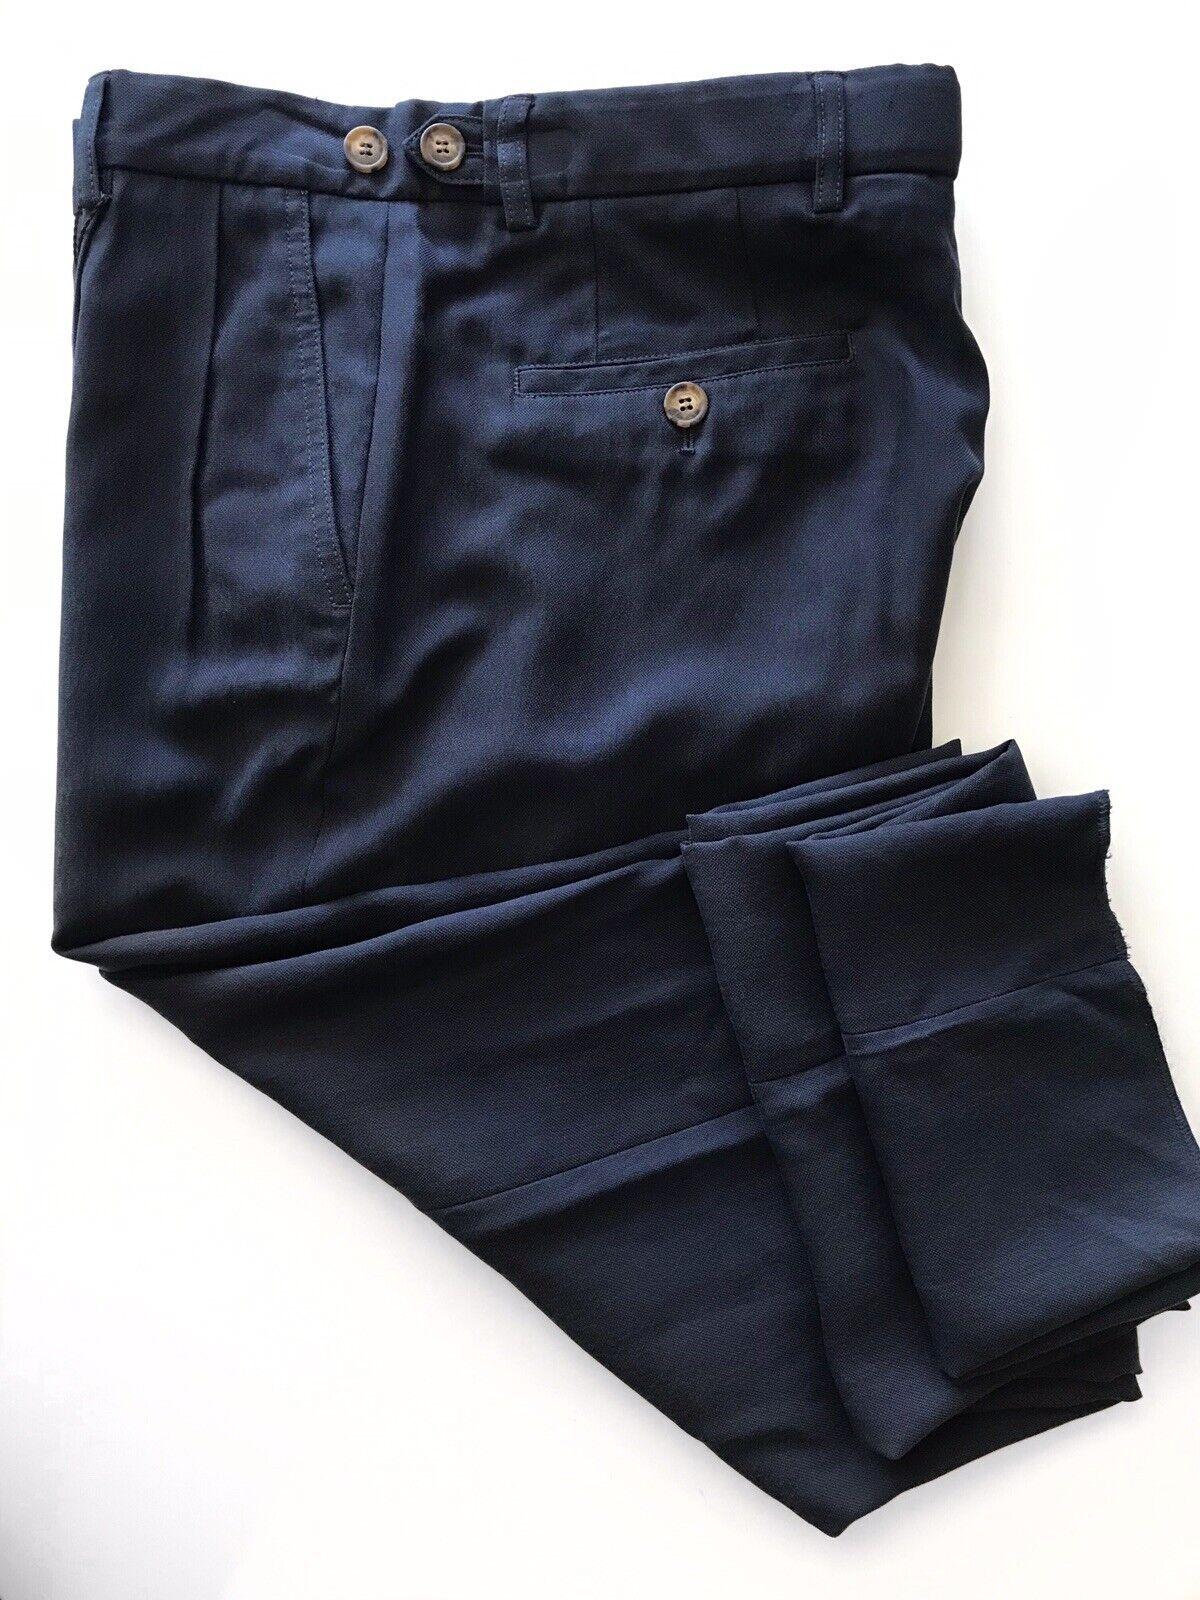 New  Giorgio Armani Men's Cotton Navy Casual Pants Size 34US (50 Eu)